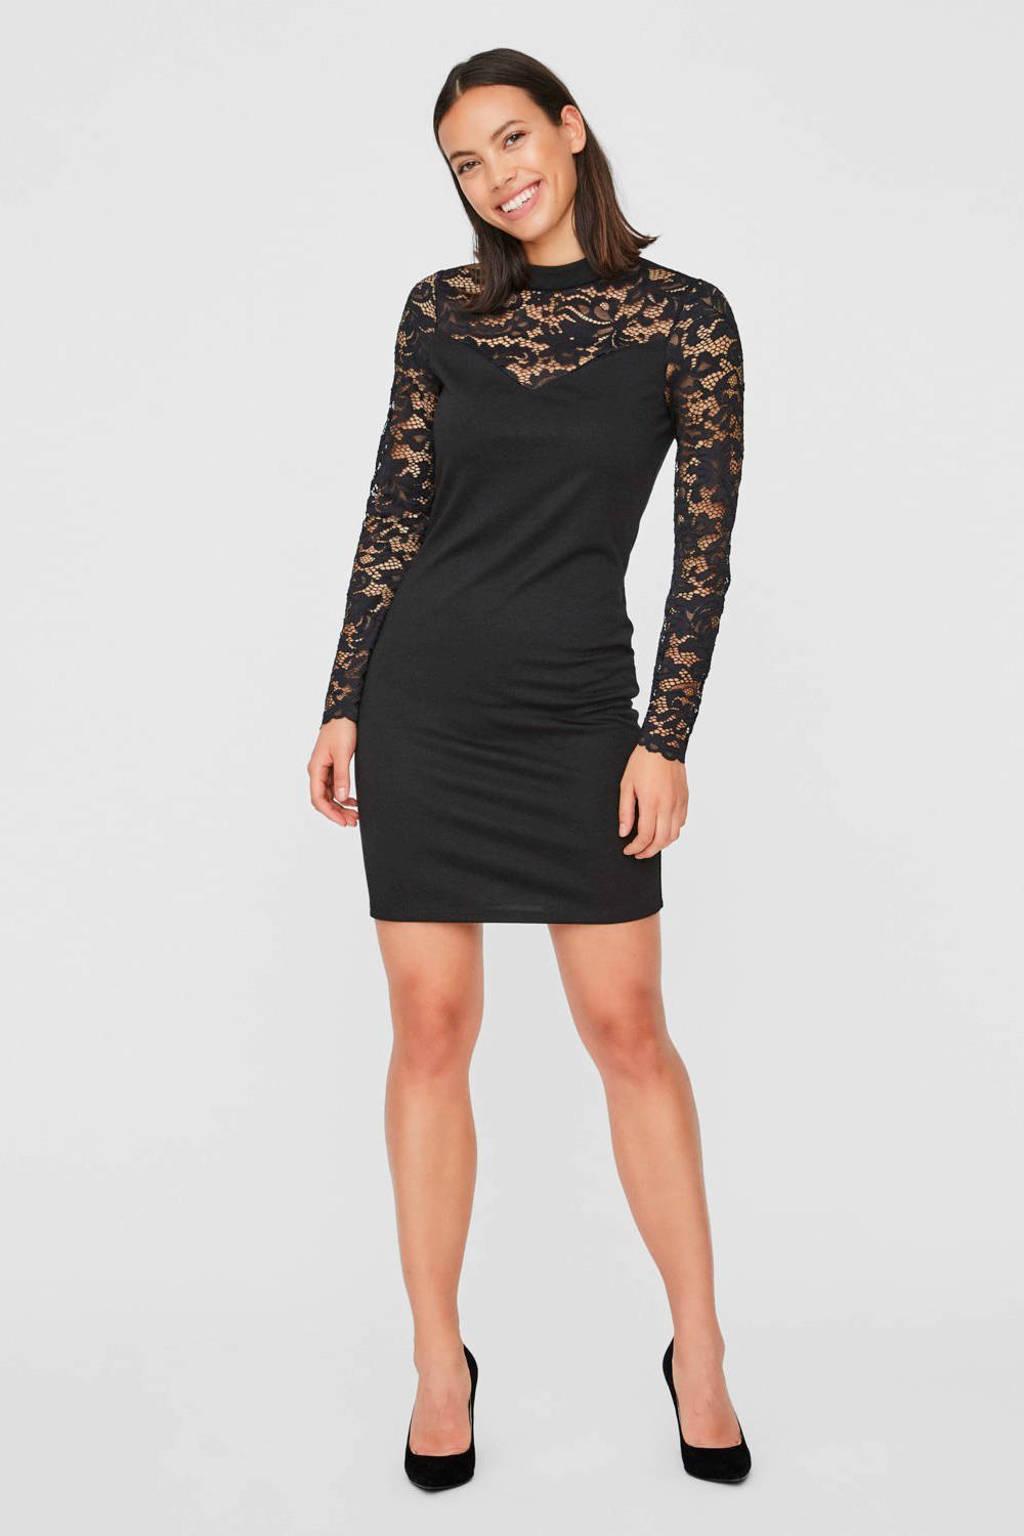 VERO MODA jurk met kant zwart, Zwart